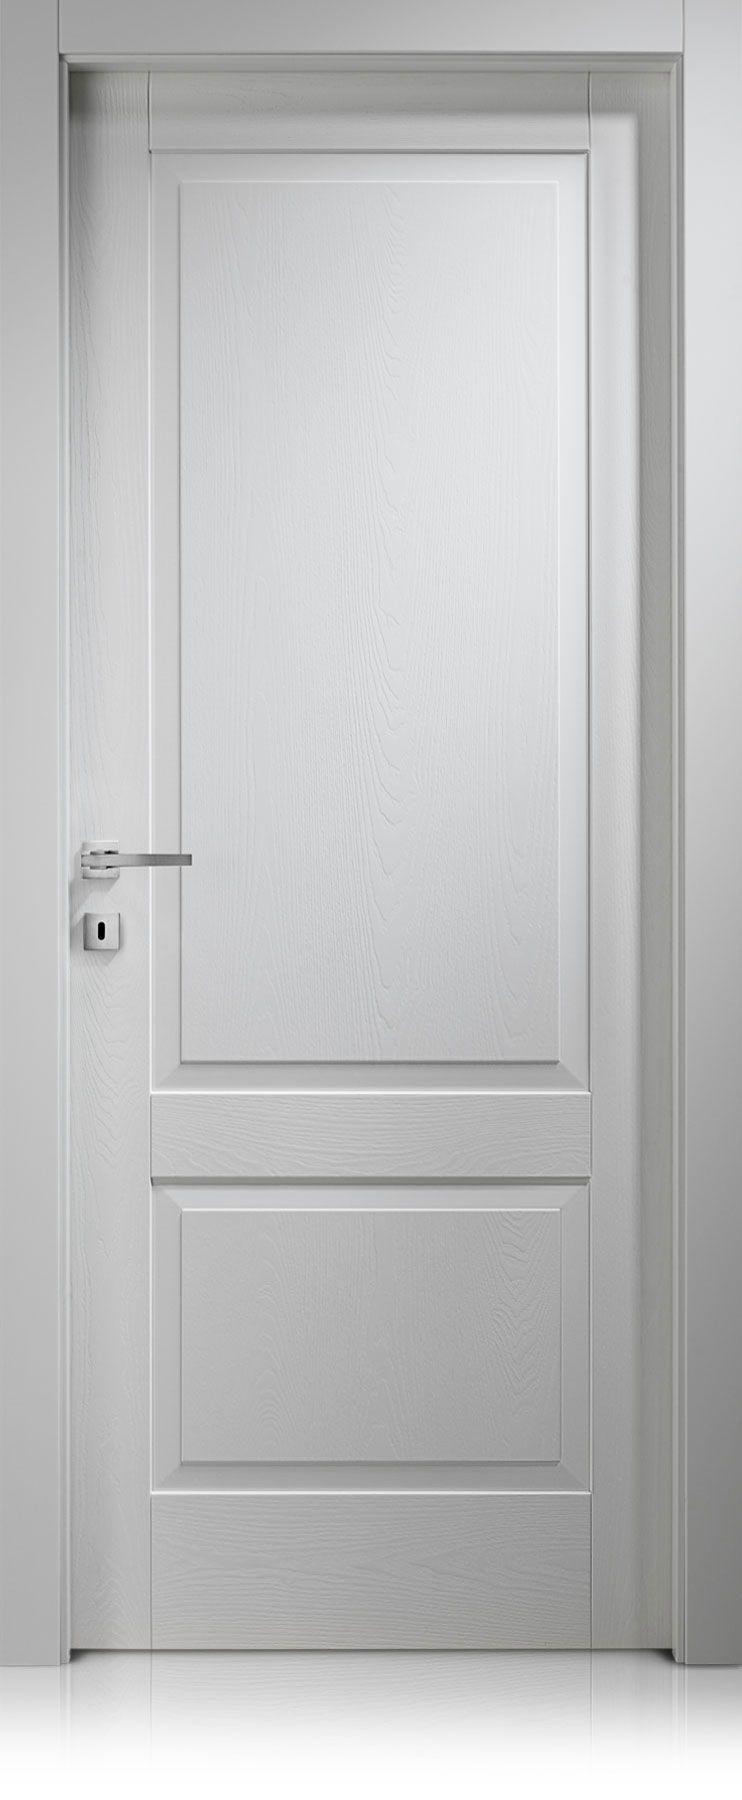 7 best Maniglie per porte images on Pinterest | Antique doors ...